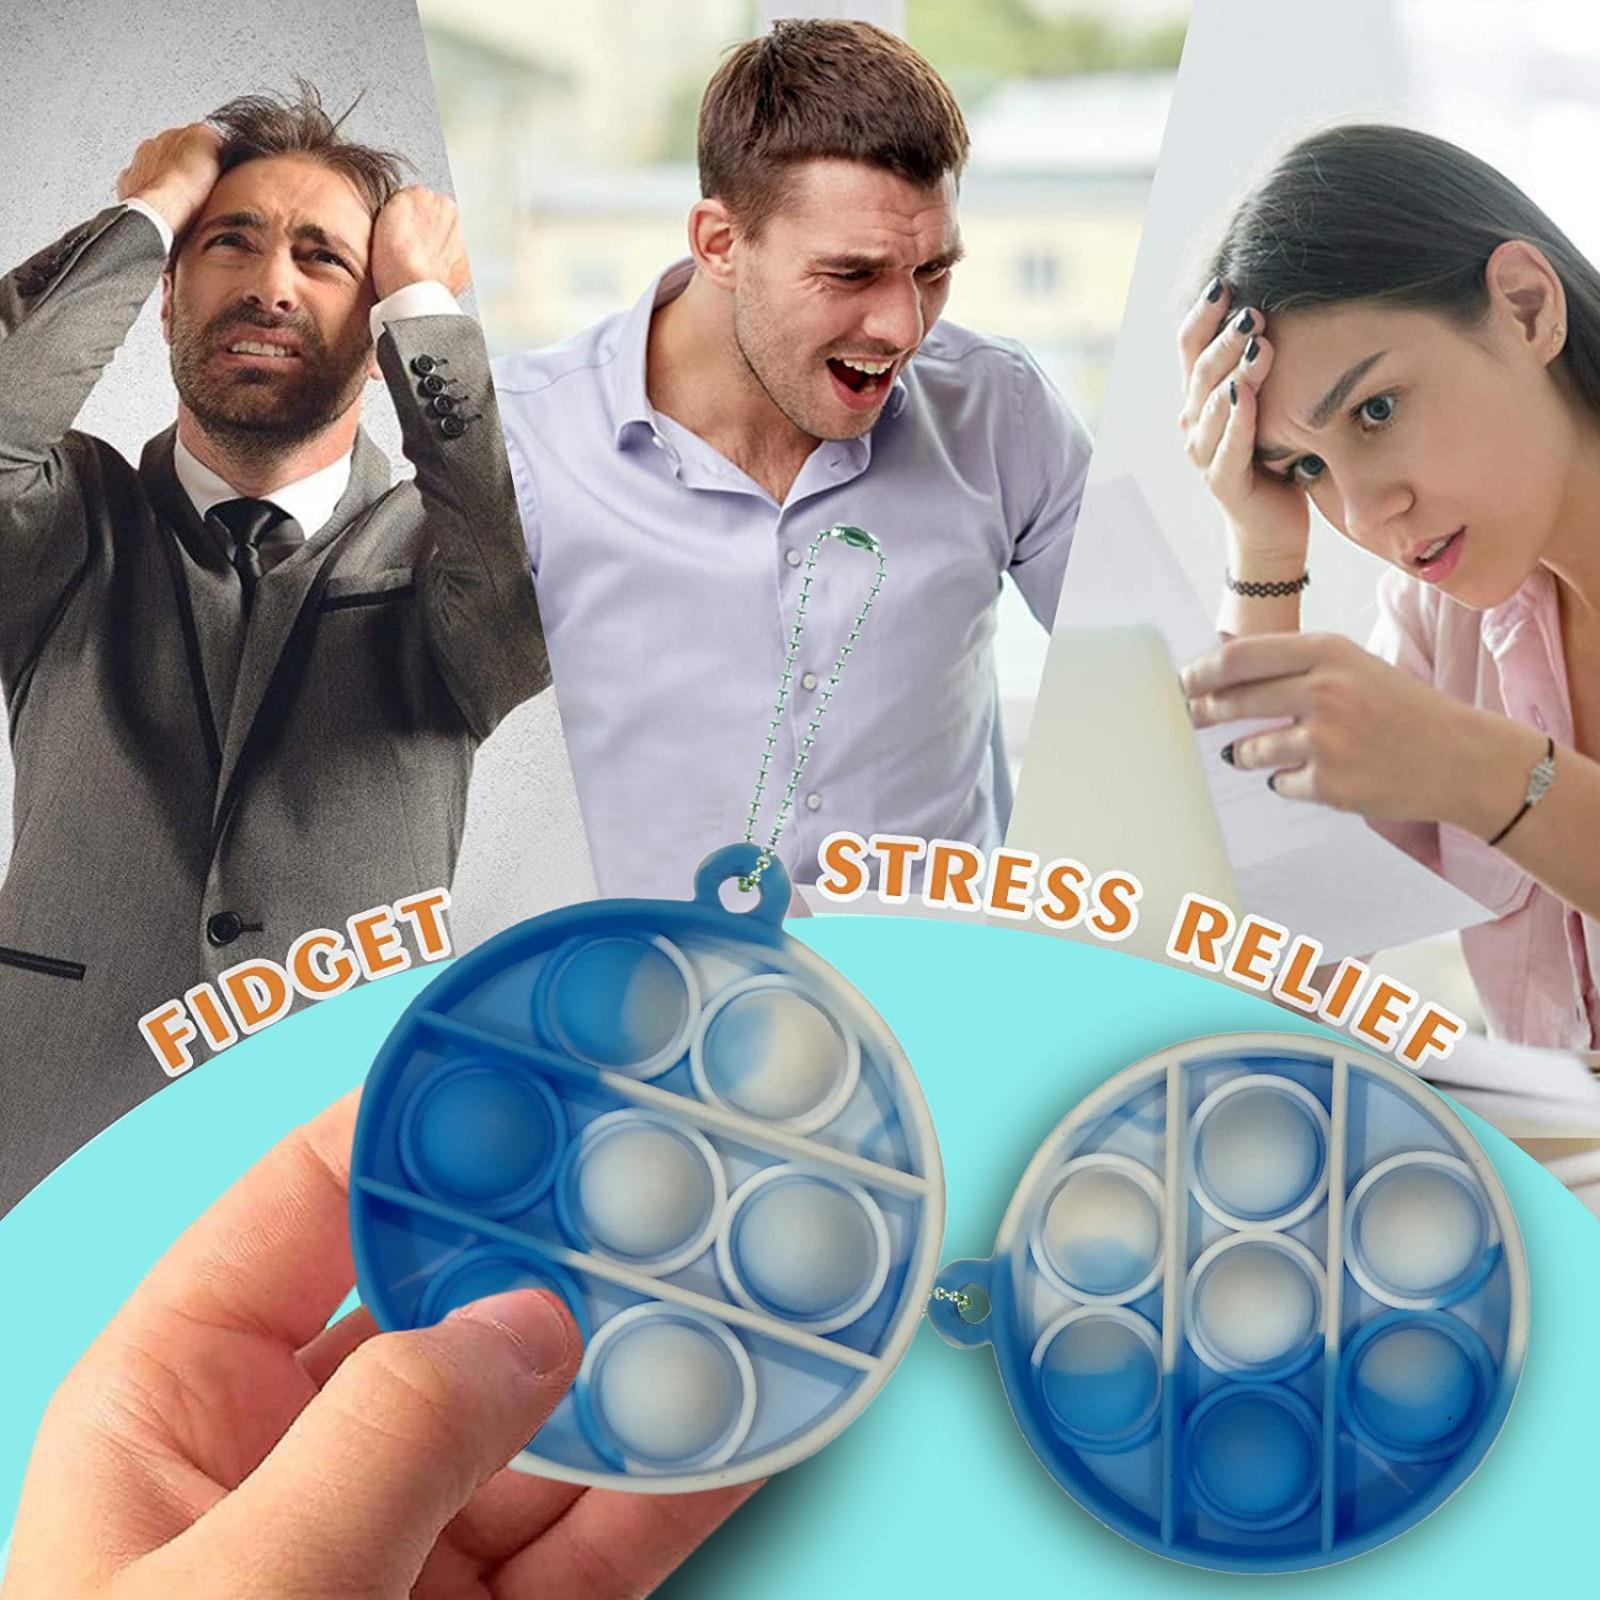 Toys Adult Bubble-Sensory-Toy Autism Fidget Reliver-Stress Funny Squishy Push-Pop Pop-It img2